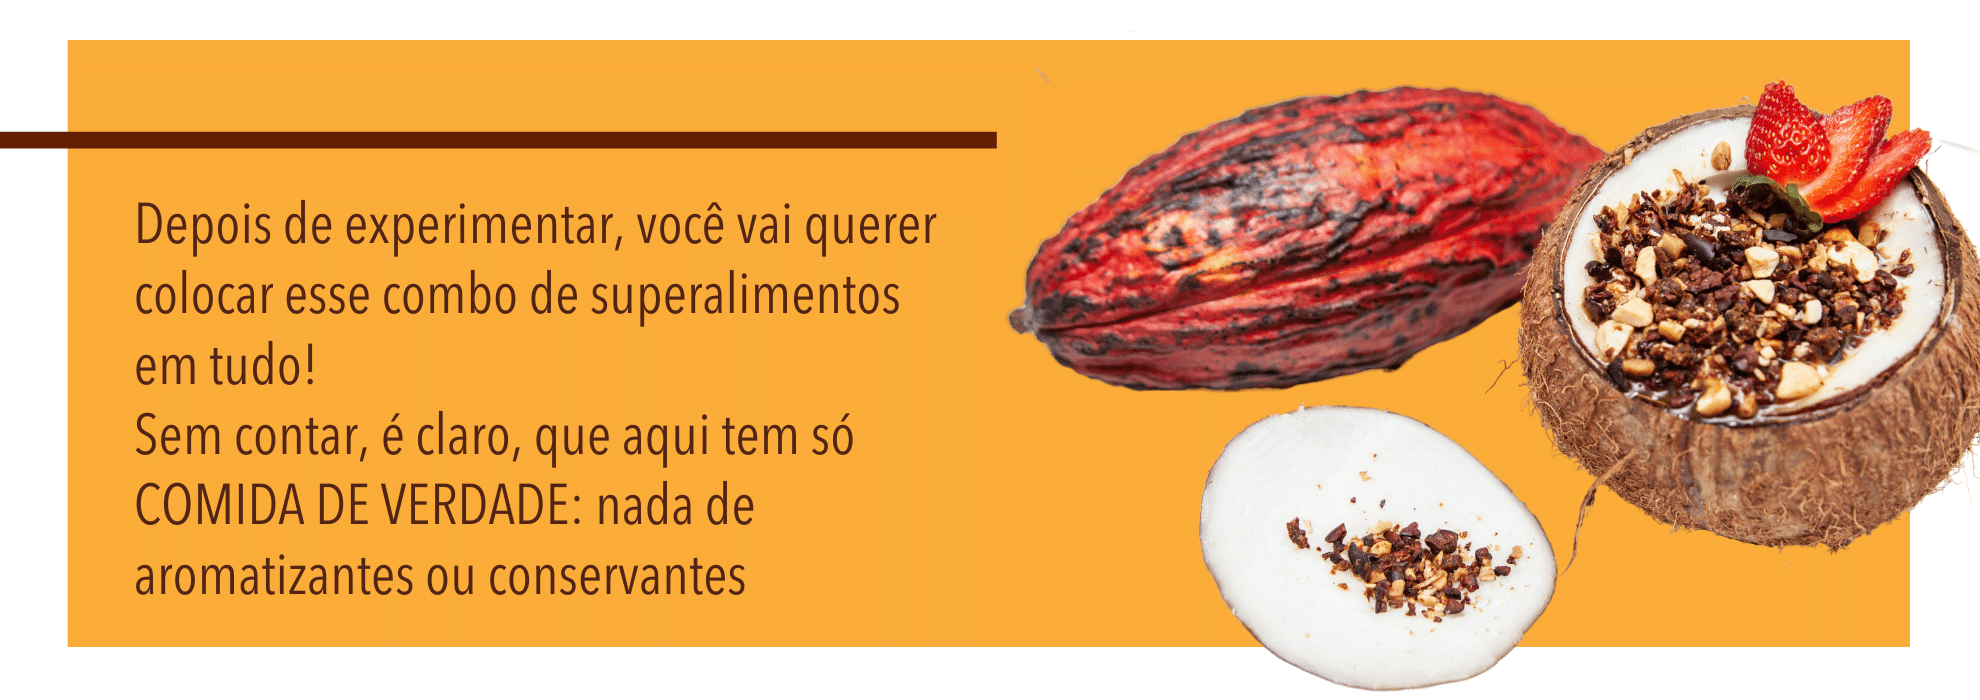 cacaonola cookoa granola 4